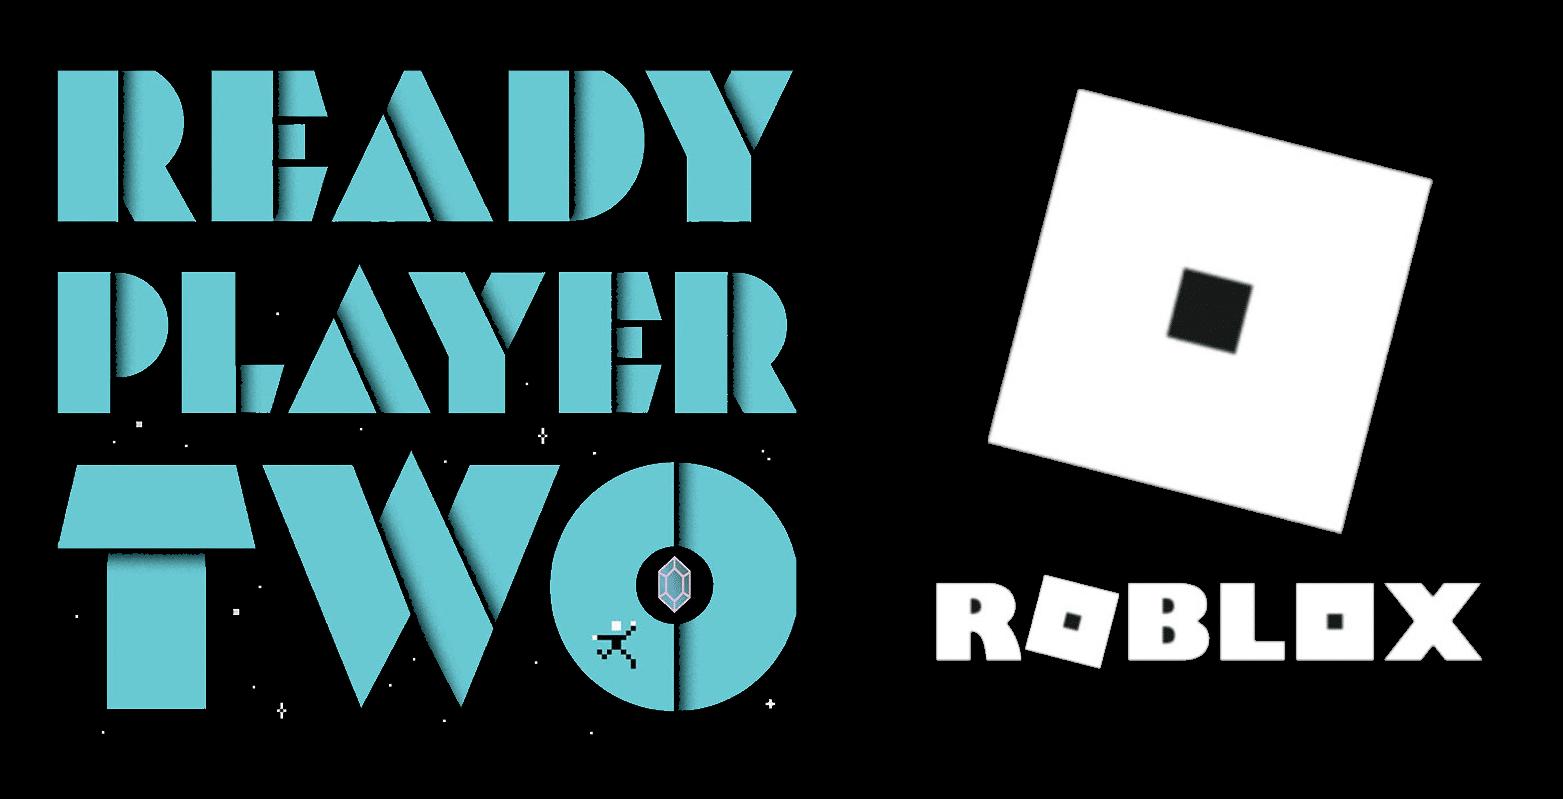 mnnxlavk5woiim https thathashtagshow com 2020 11 23 ready player two gets roblox scavenger hunt